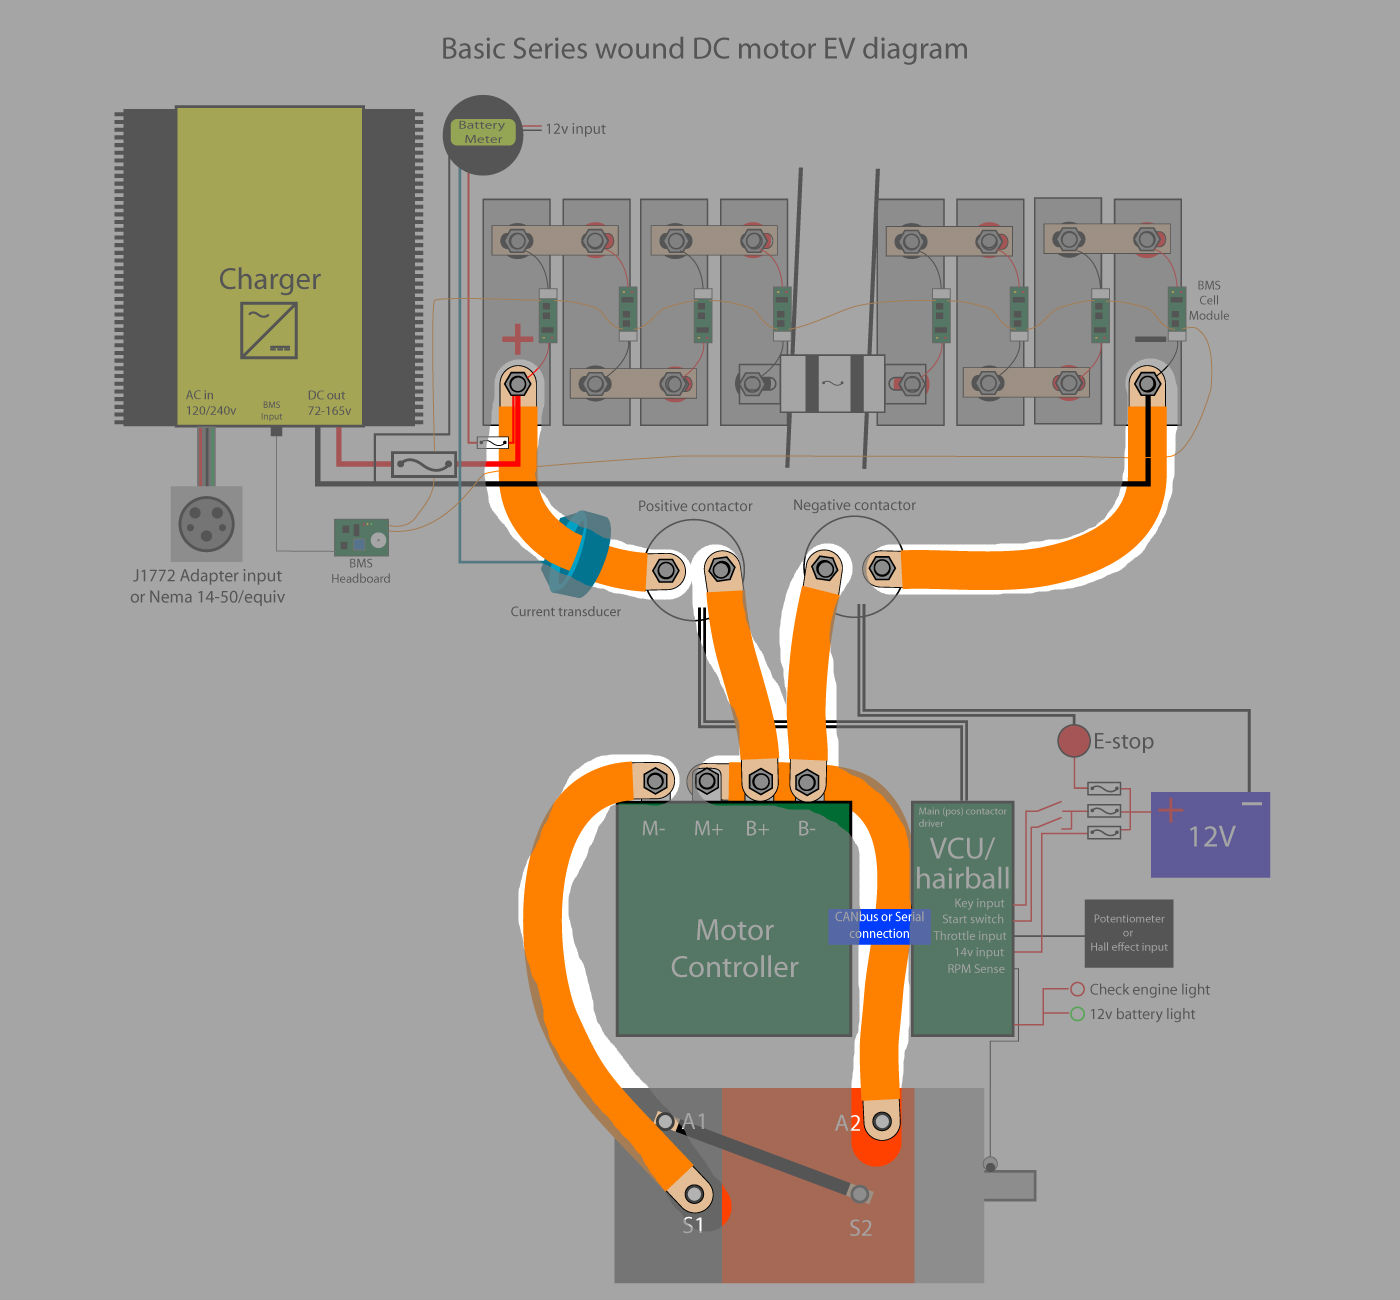 ev diy 3 component diagram conductors?resize\\\=1400%2C1300\\\&ssl\\\=1 ev motor wiring diagram electrical wiring diagrams